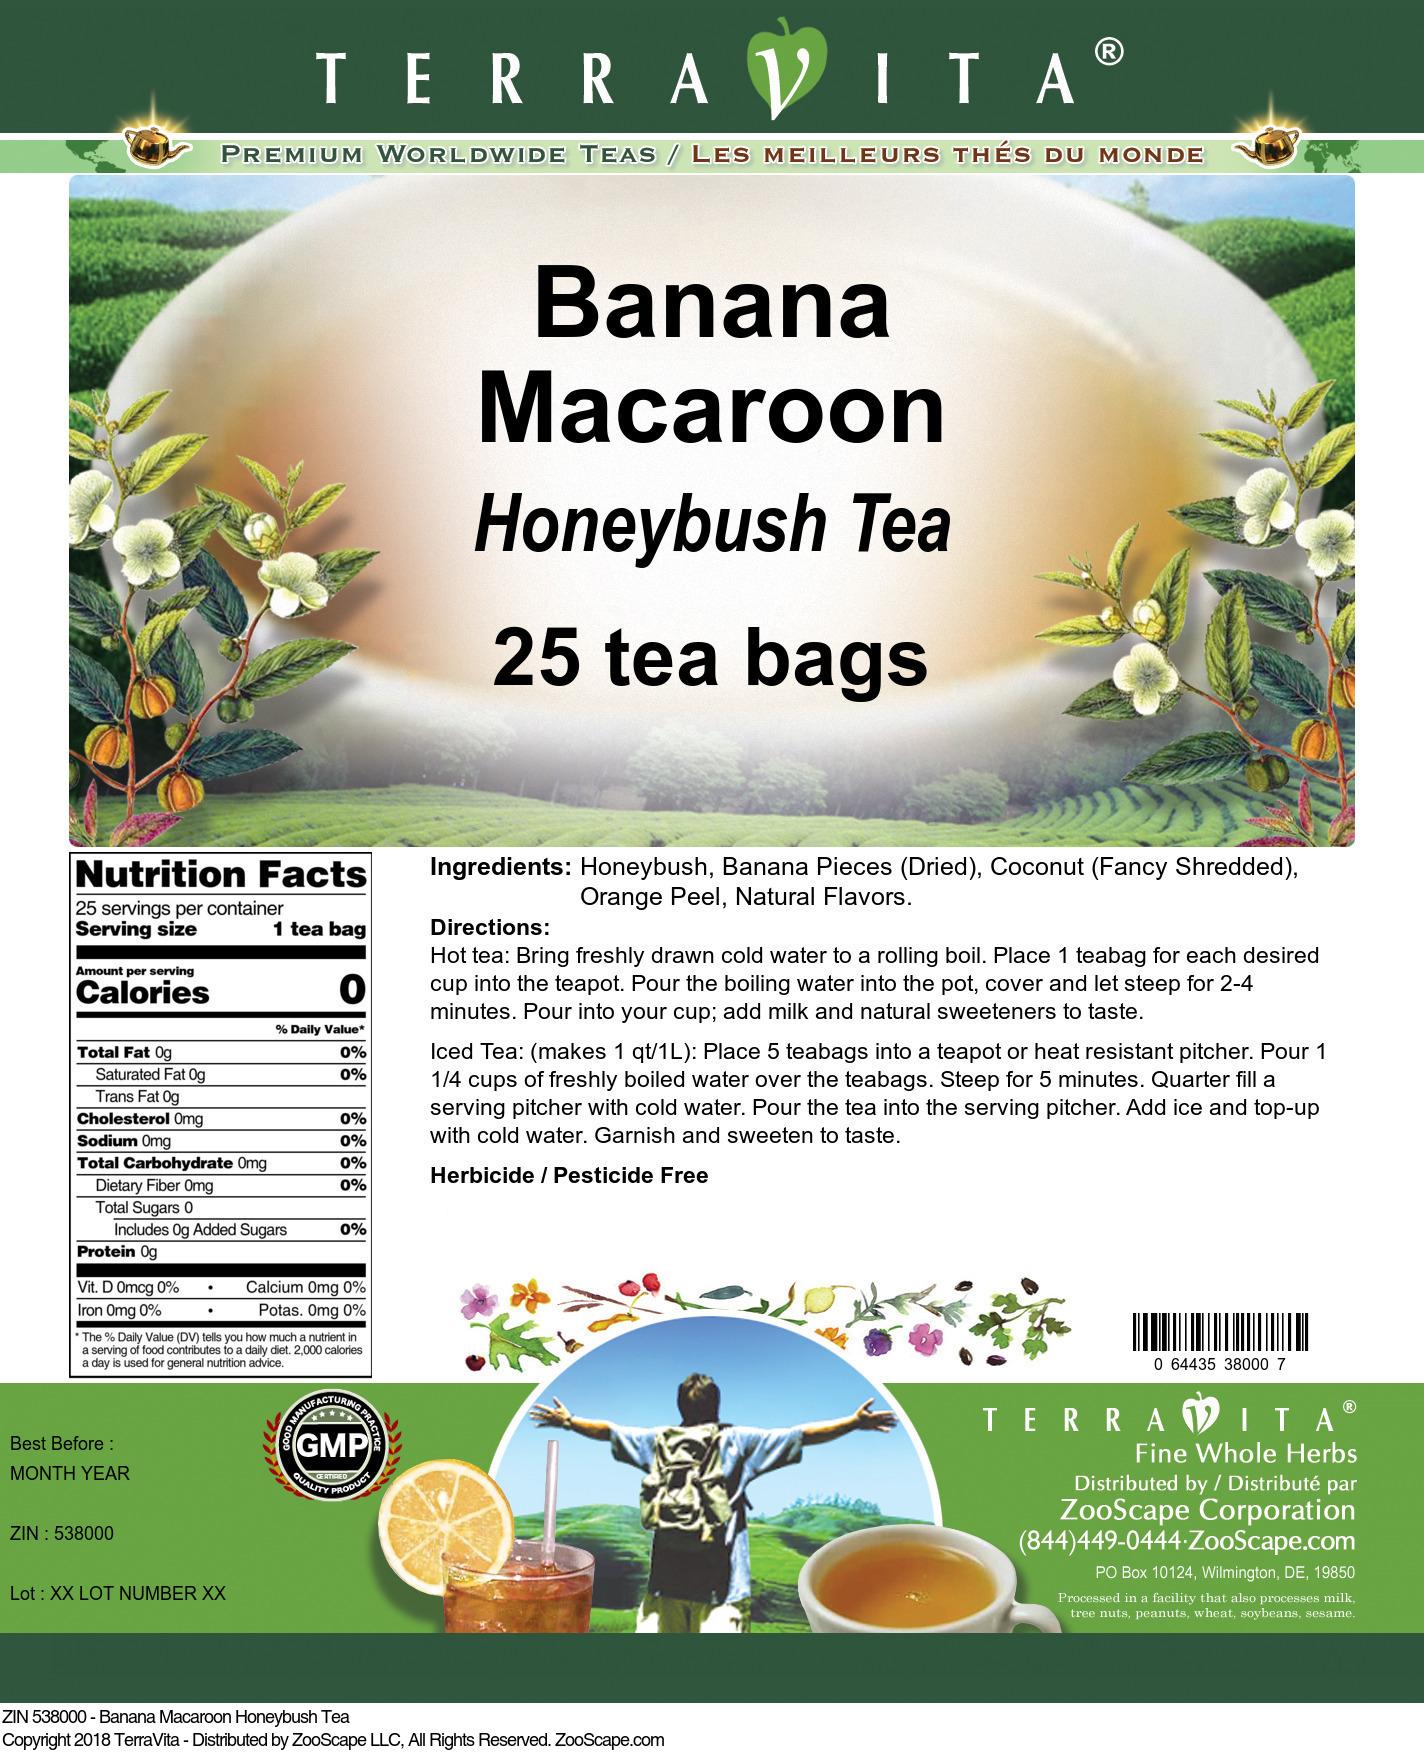 Banana Macaroon Honeybush Tea